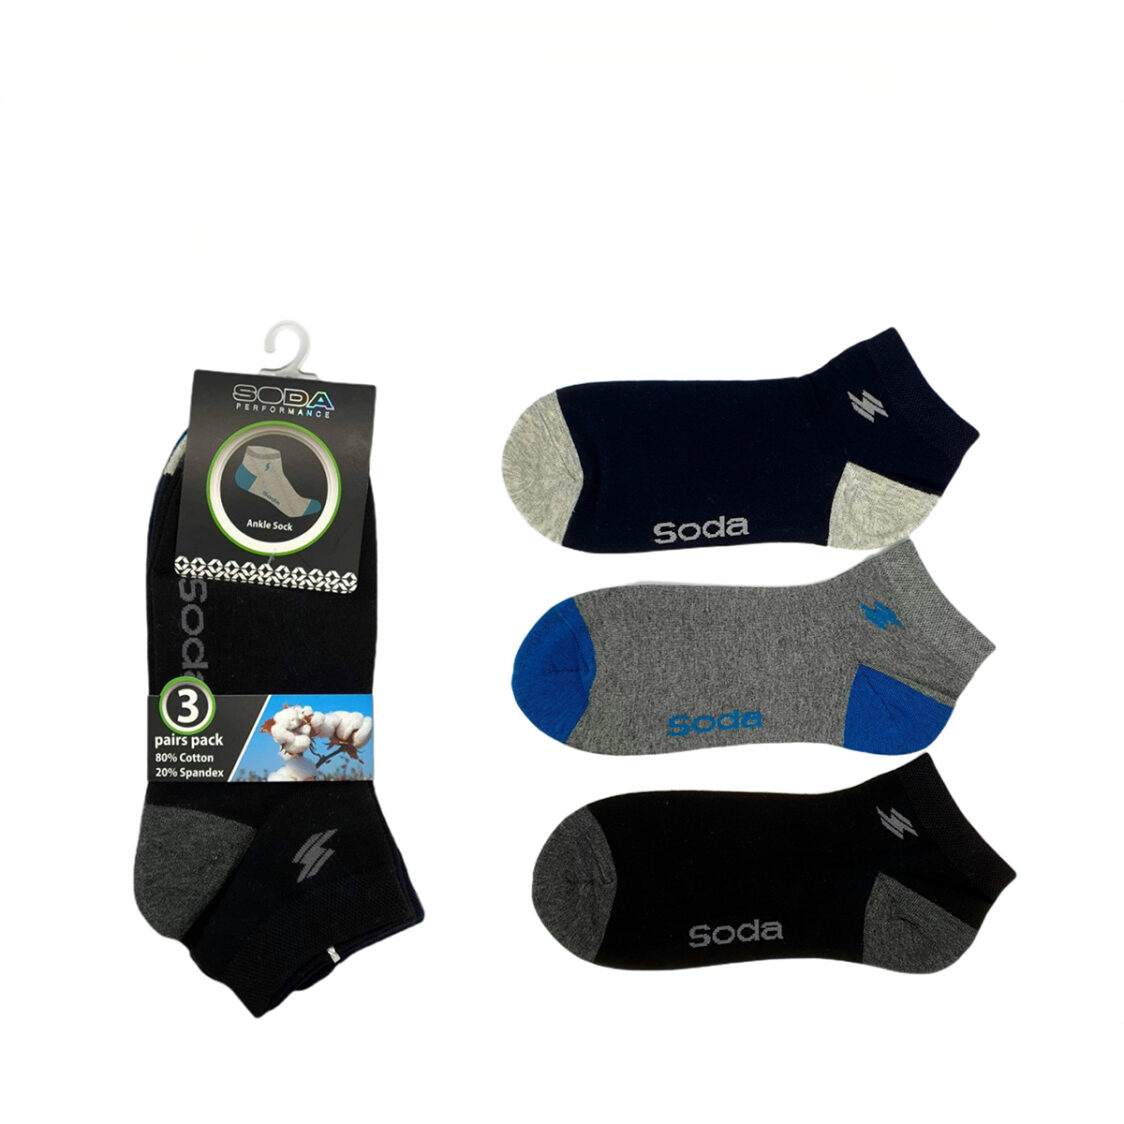 Soda 3 pc Pack Ankle Casual Socks